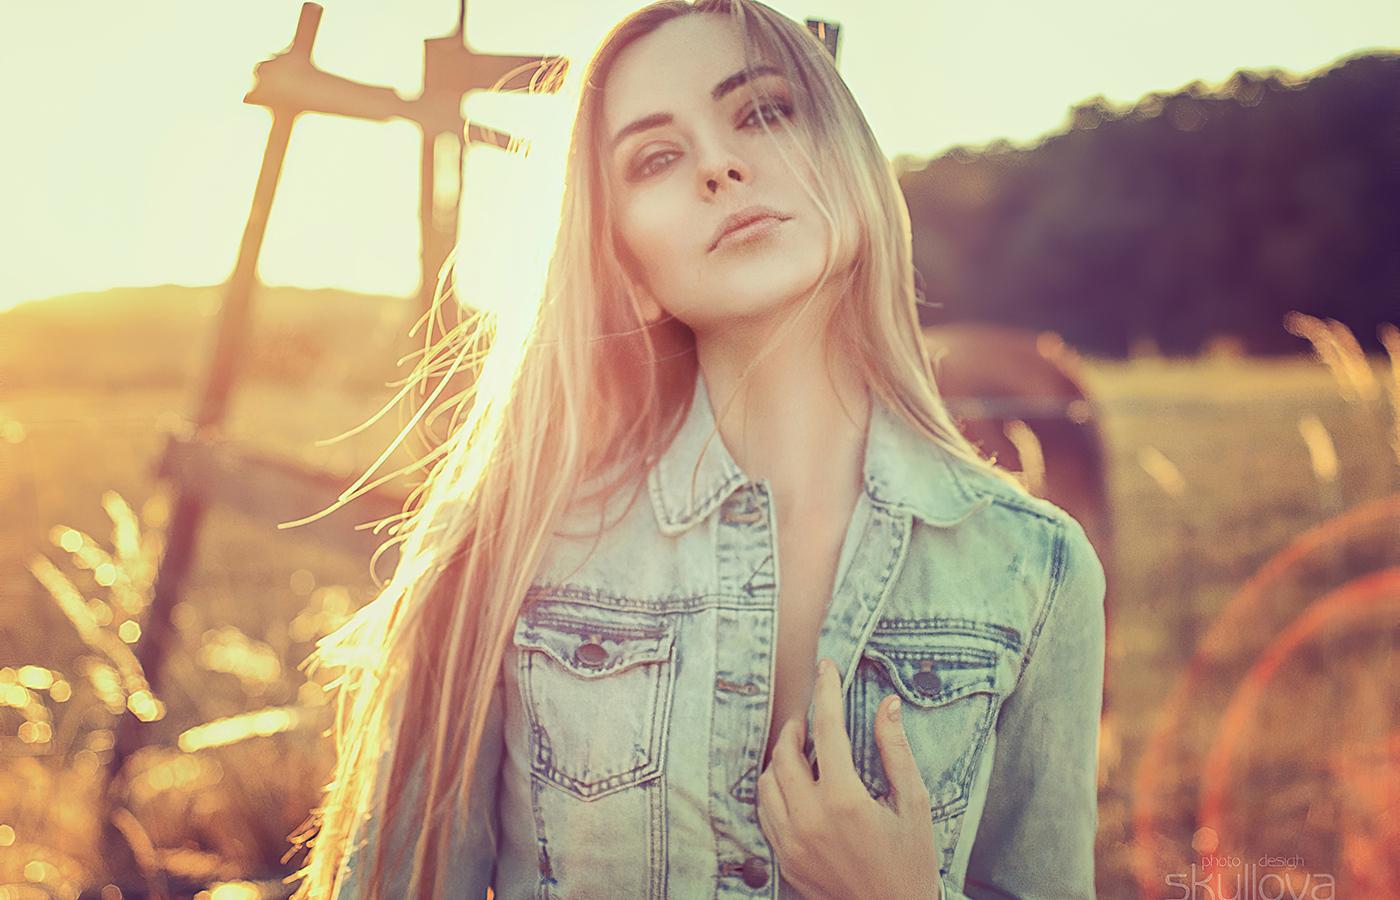 blonde-country-girl-py.jpg